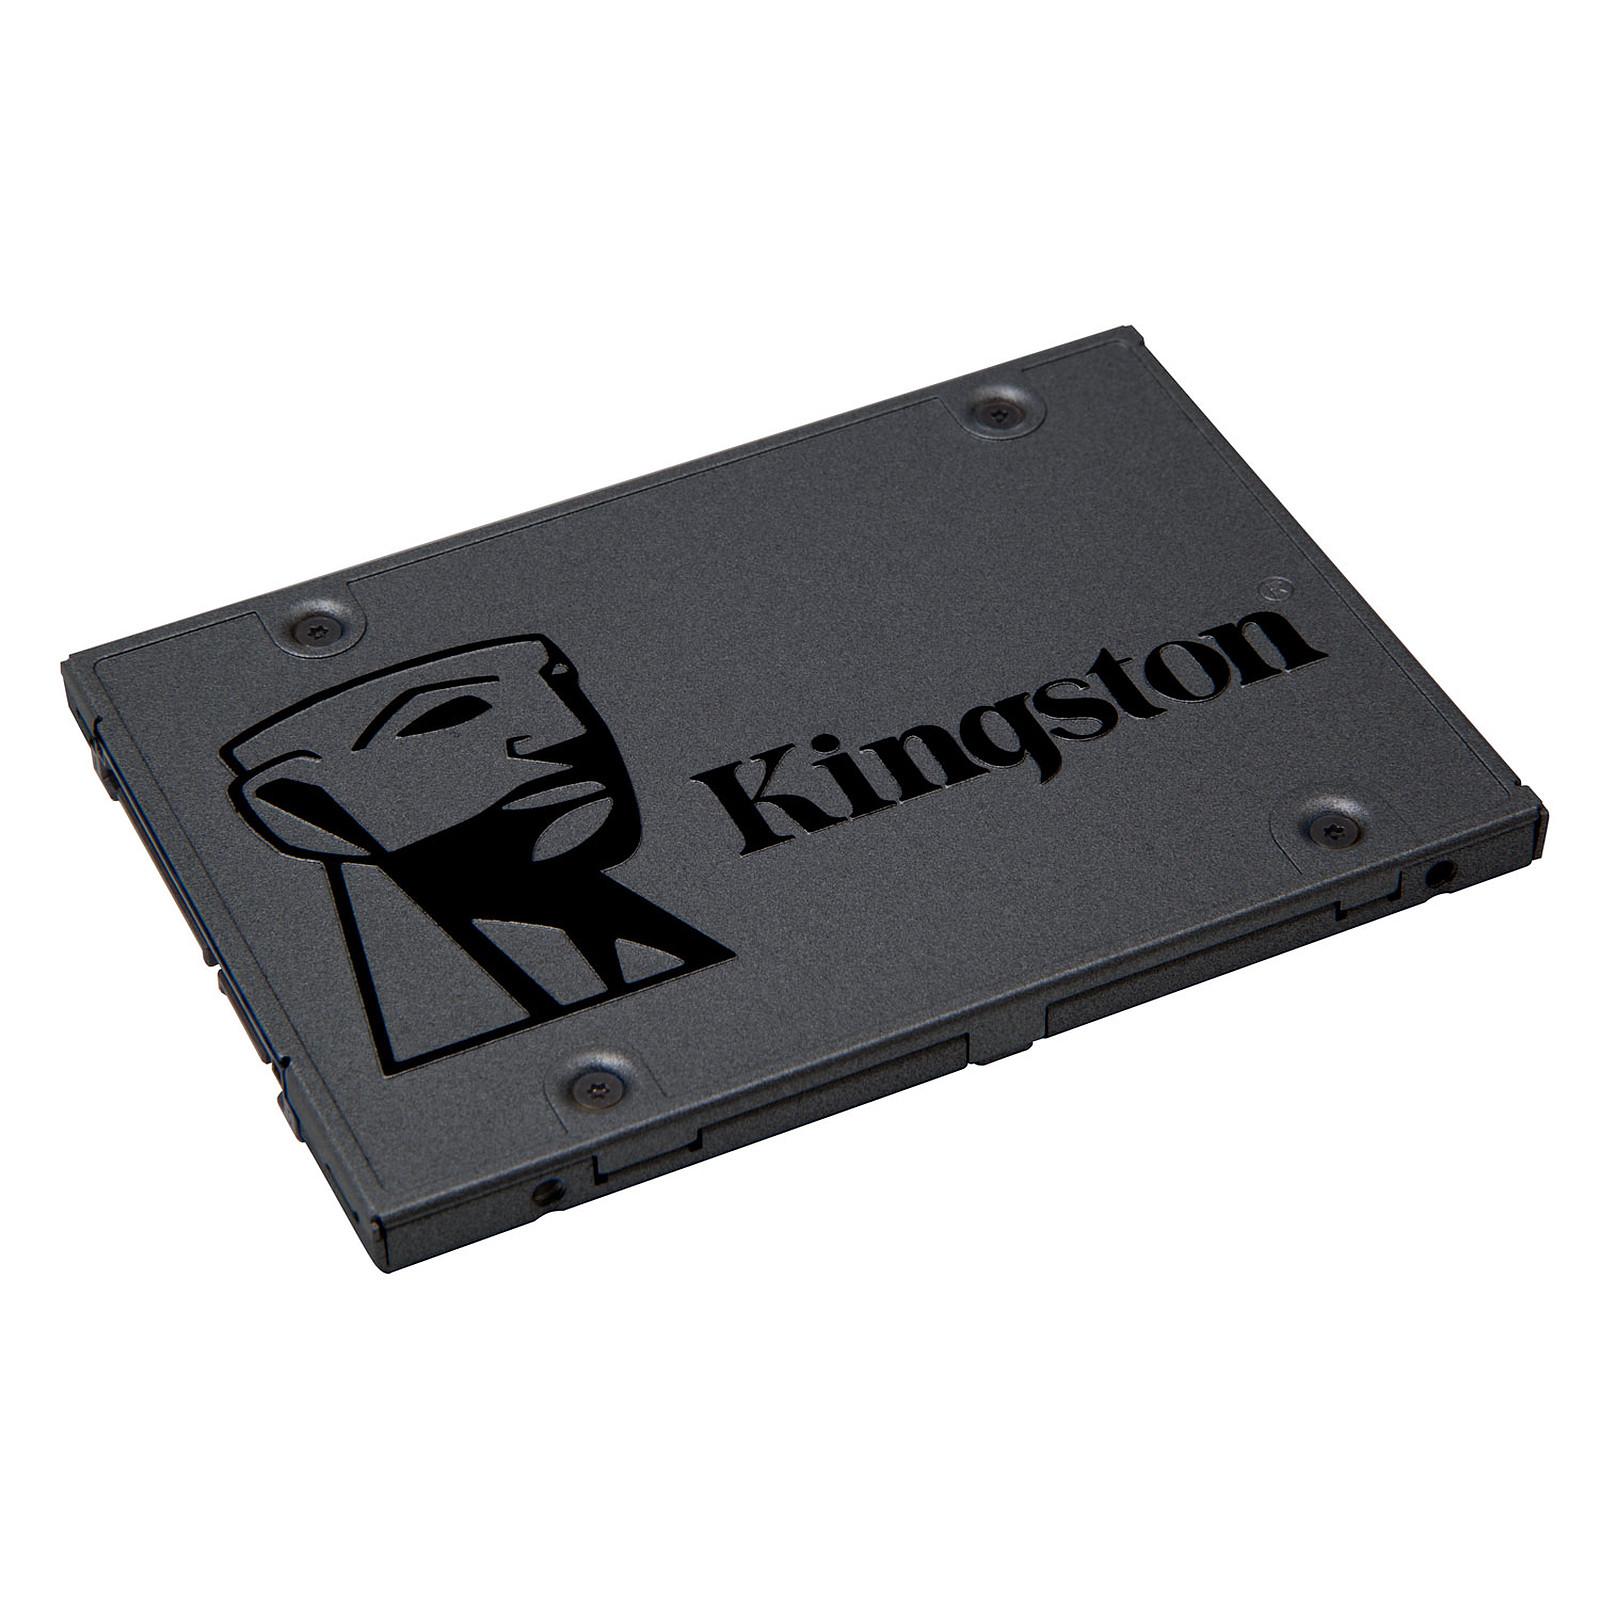 SSD interne Kingston A400 2.5'' - 960 Go